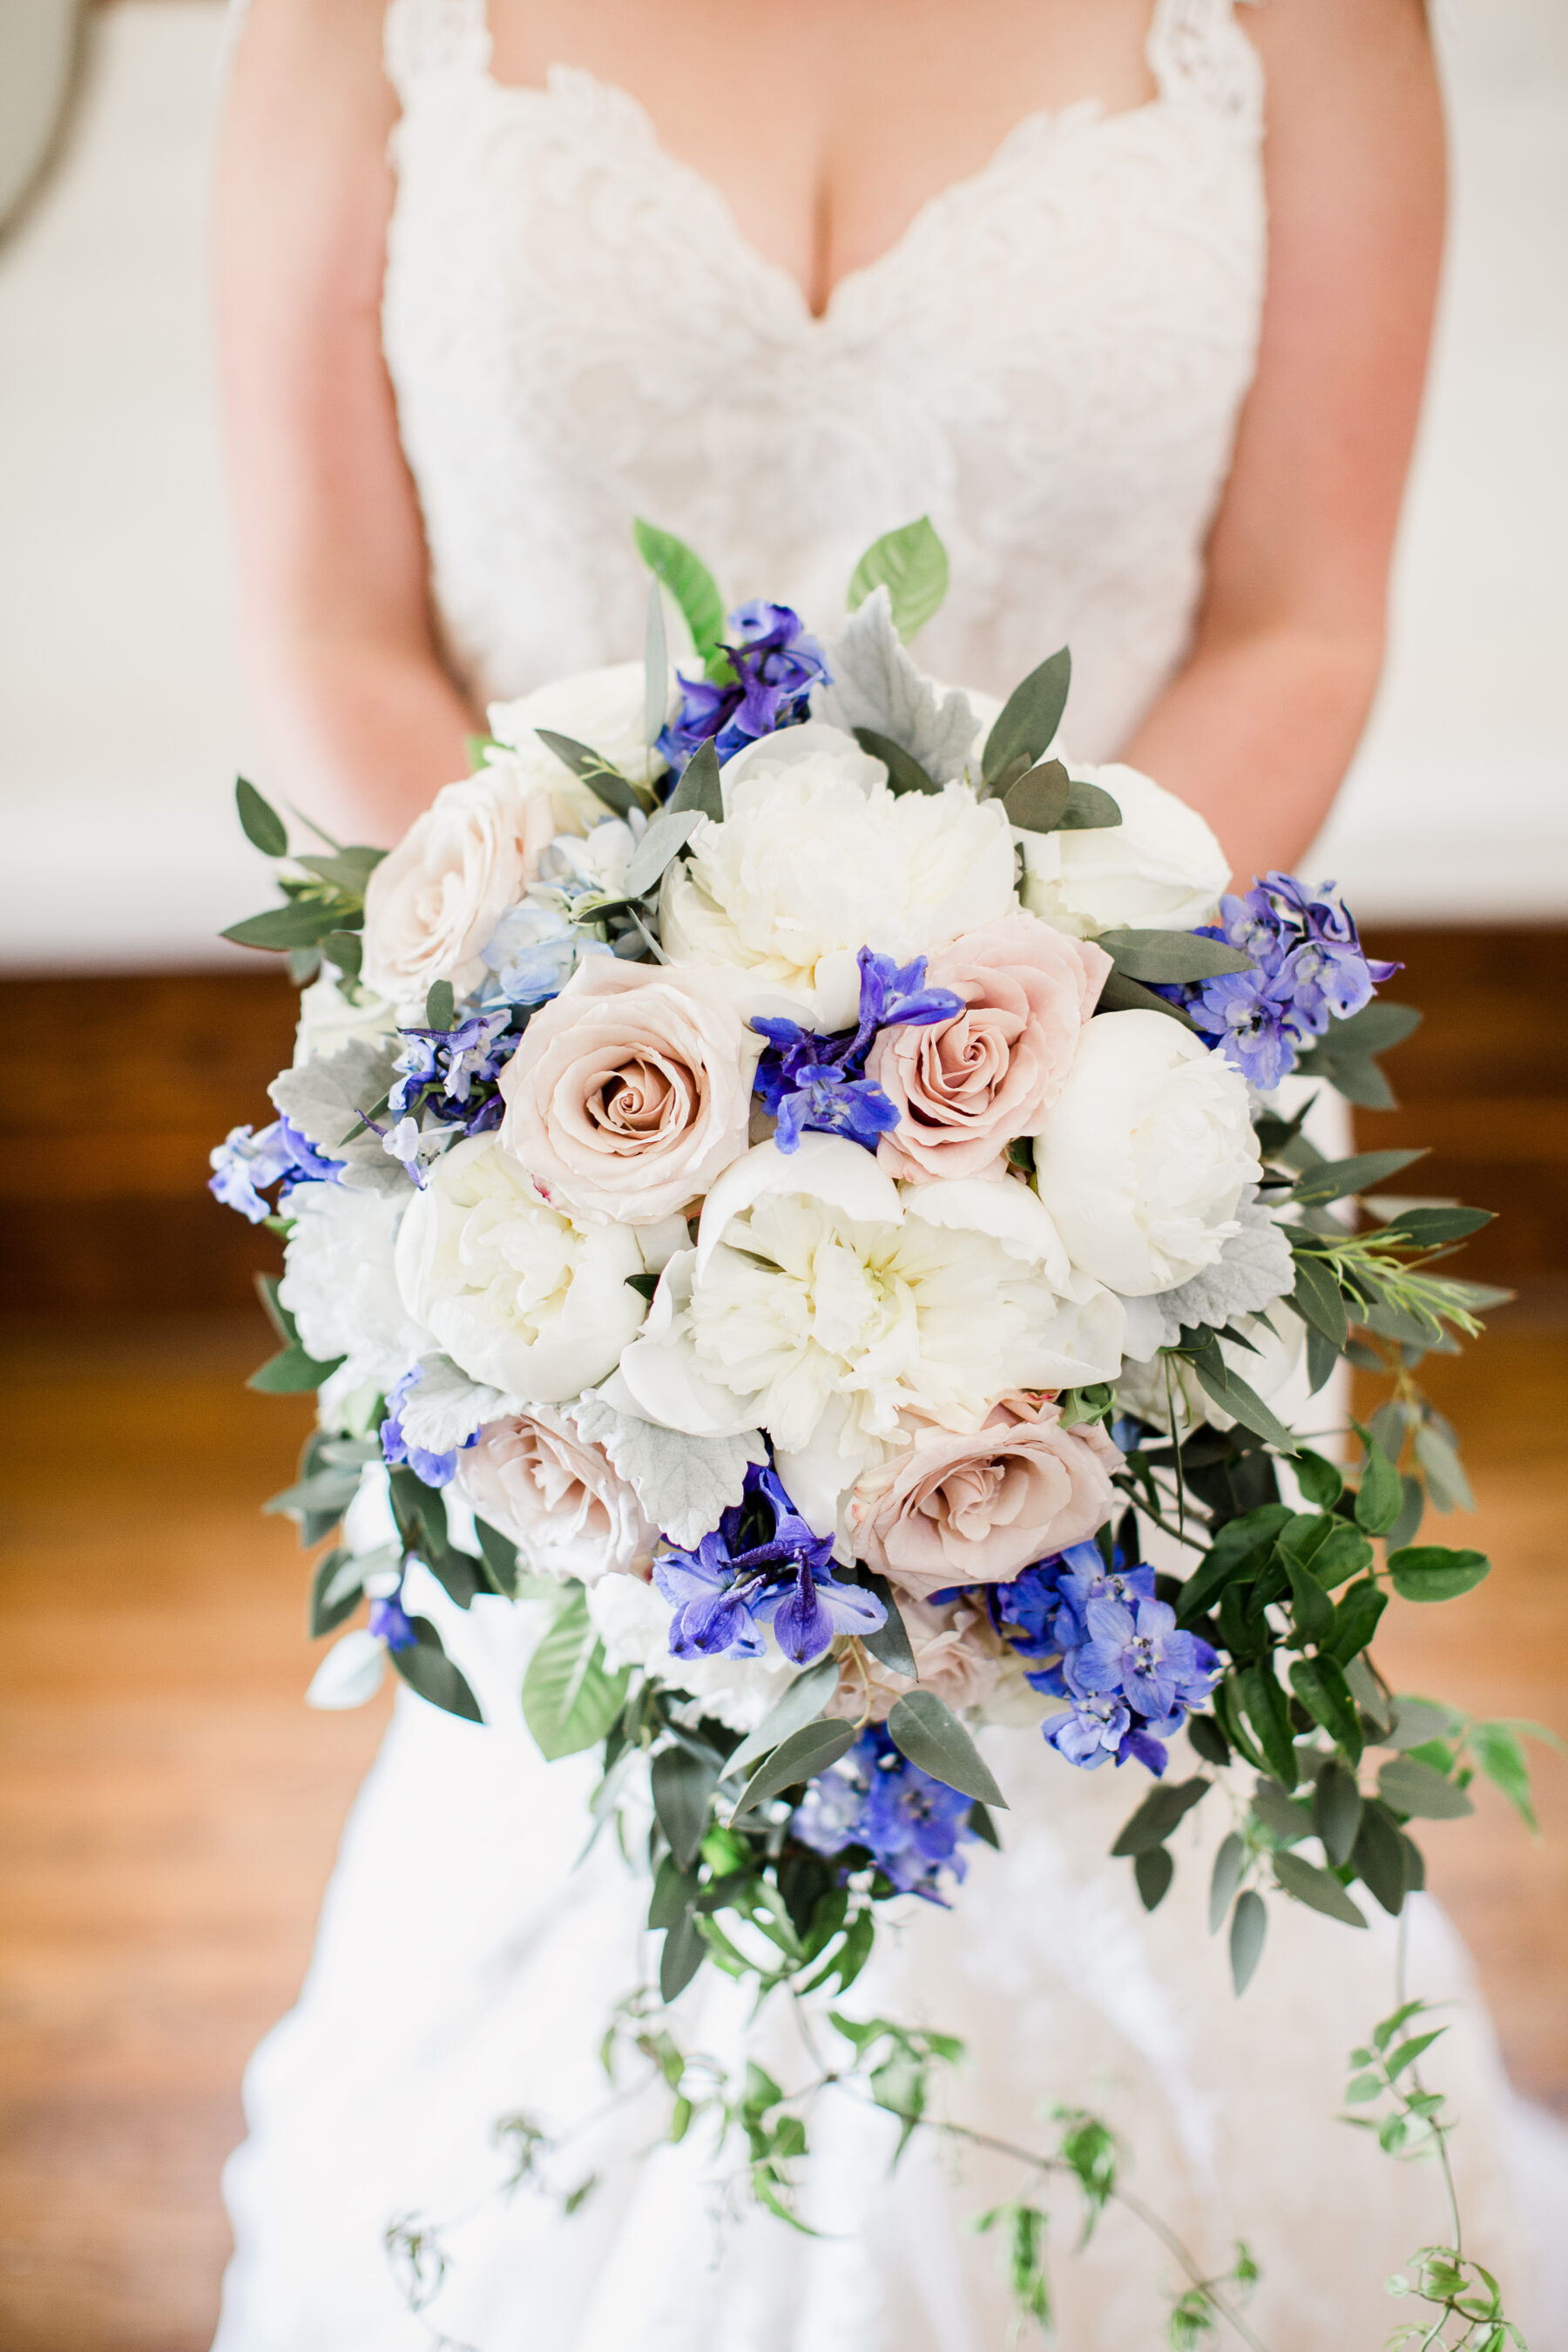 Enchanted Florist Wedding Bouquet Romantic Garden Wedding at CJ's Off the Square   Nashville Bride Guide